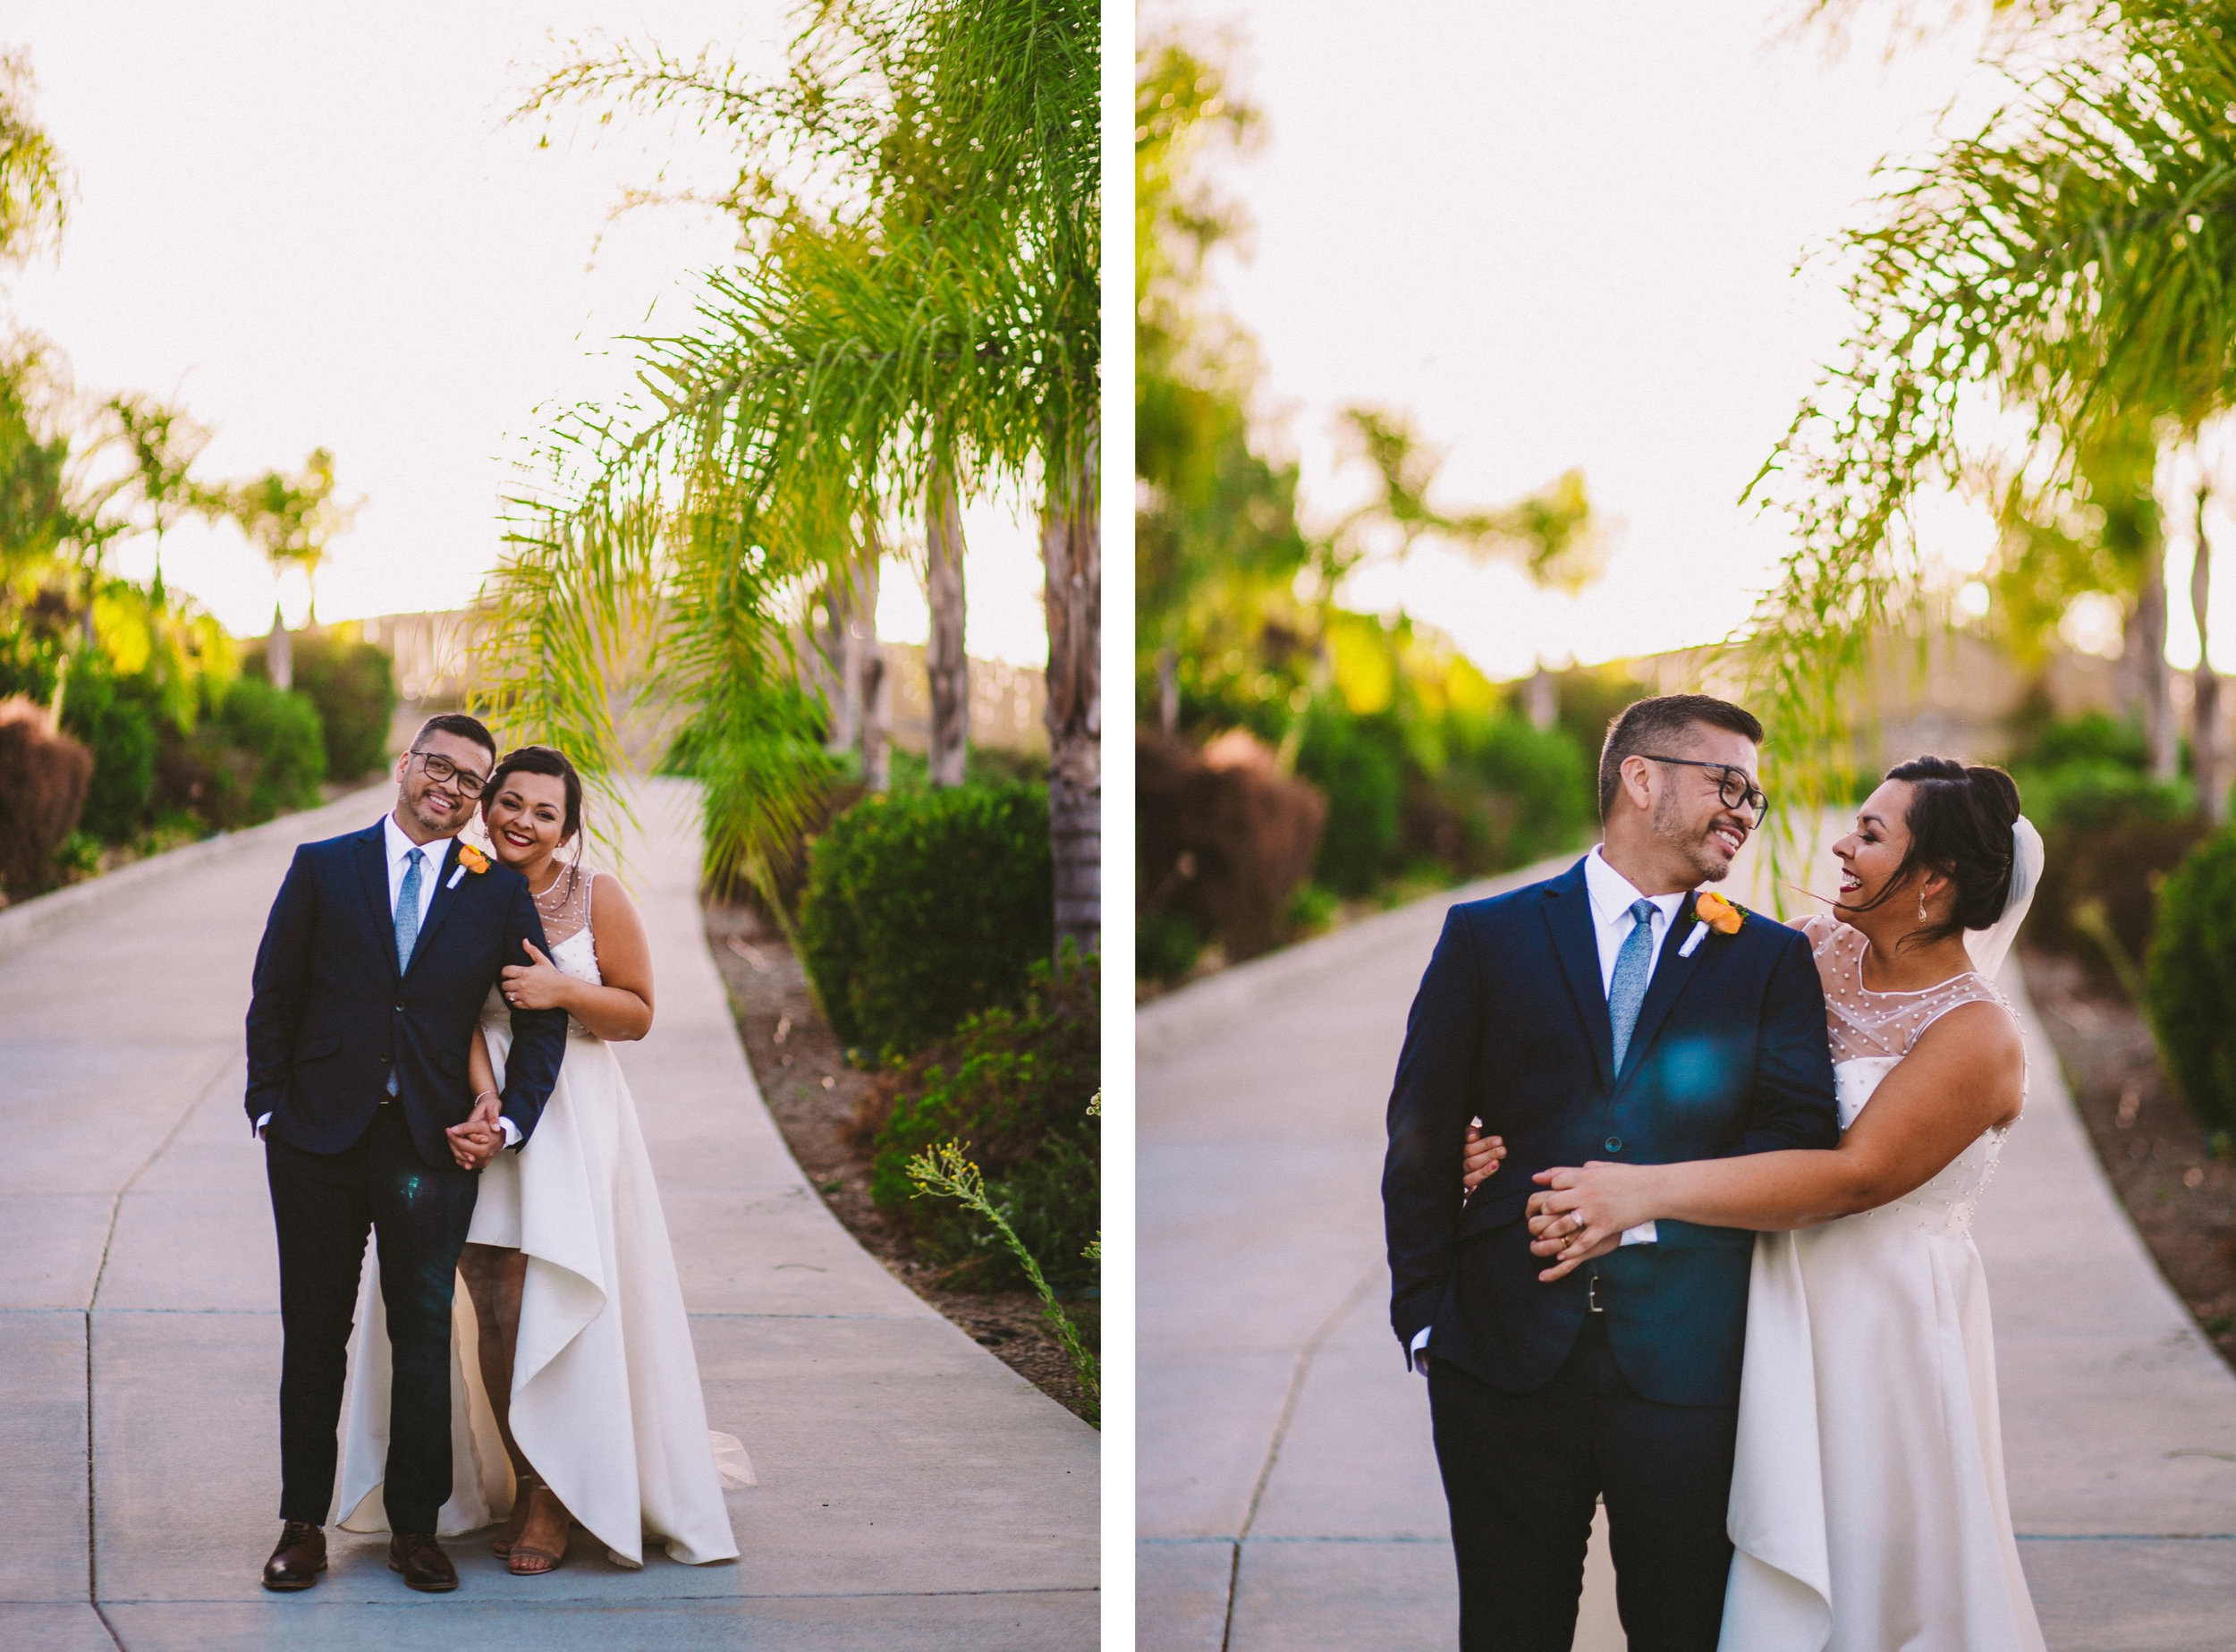 Intimate & colorful Temecula Documentary Wedding Photography-77.jpg